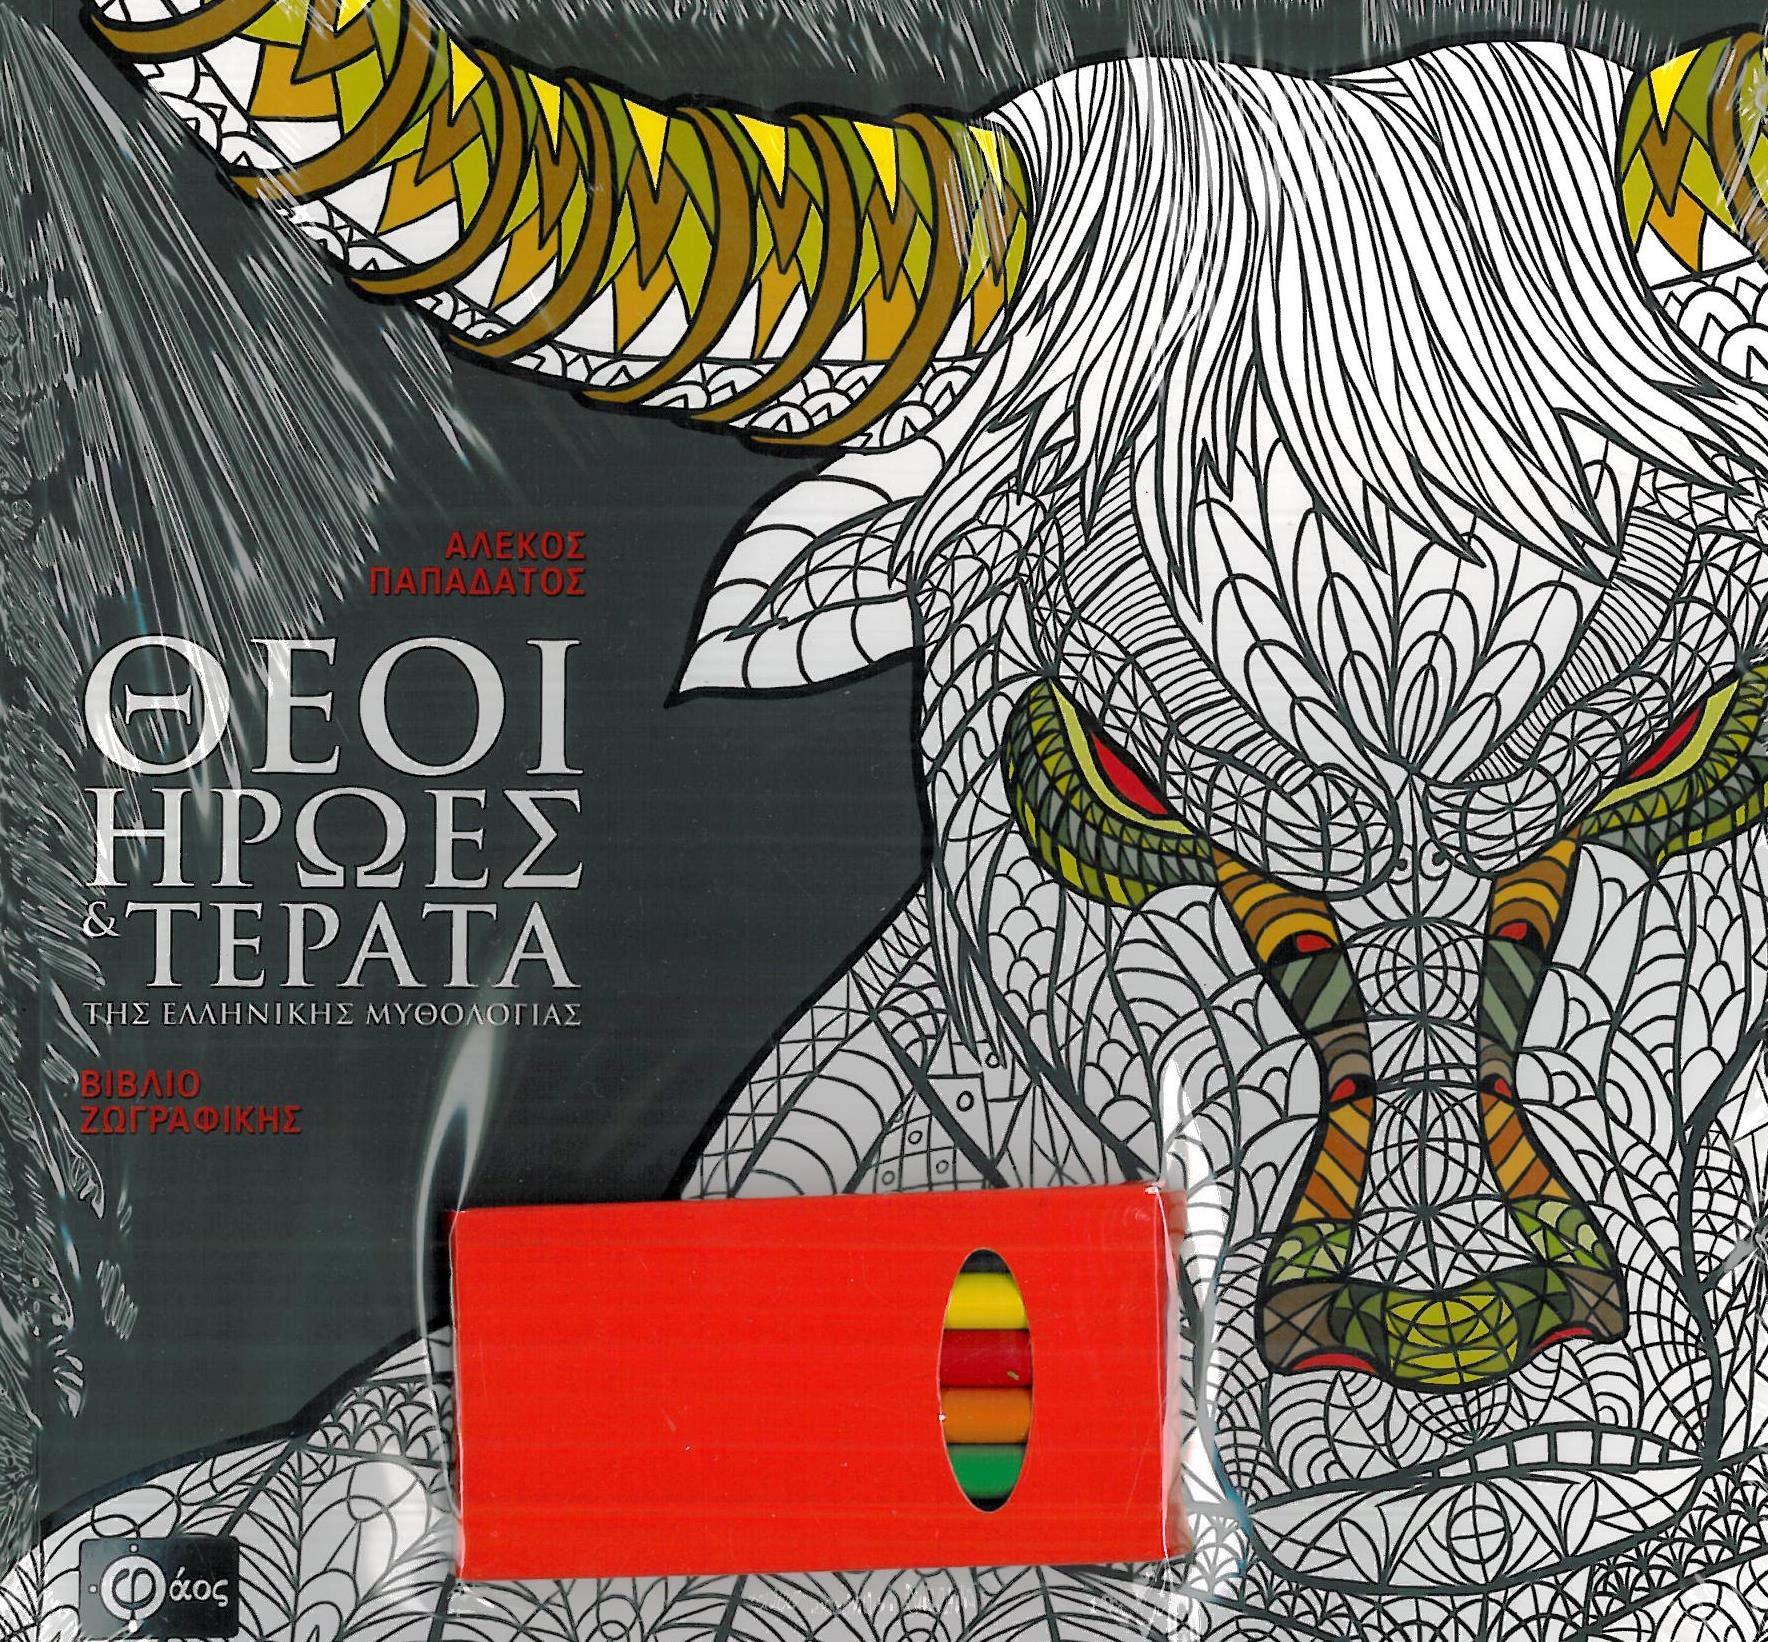 Amazon It боги герои и чудовища греческой мифологии книжка